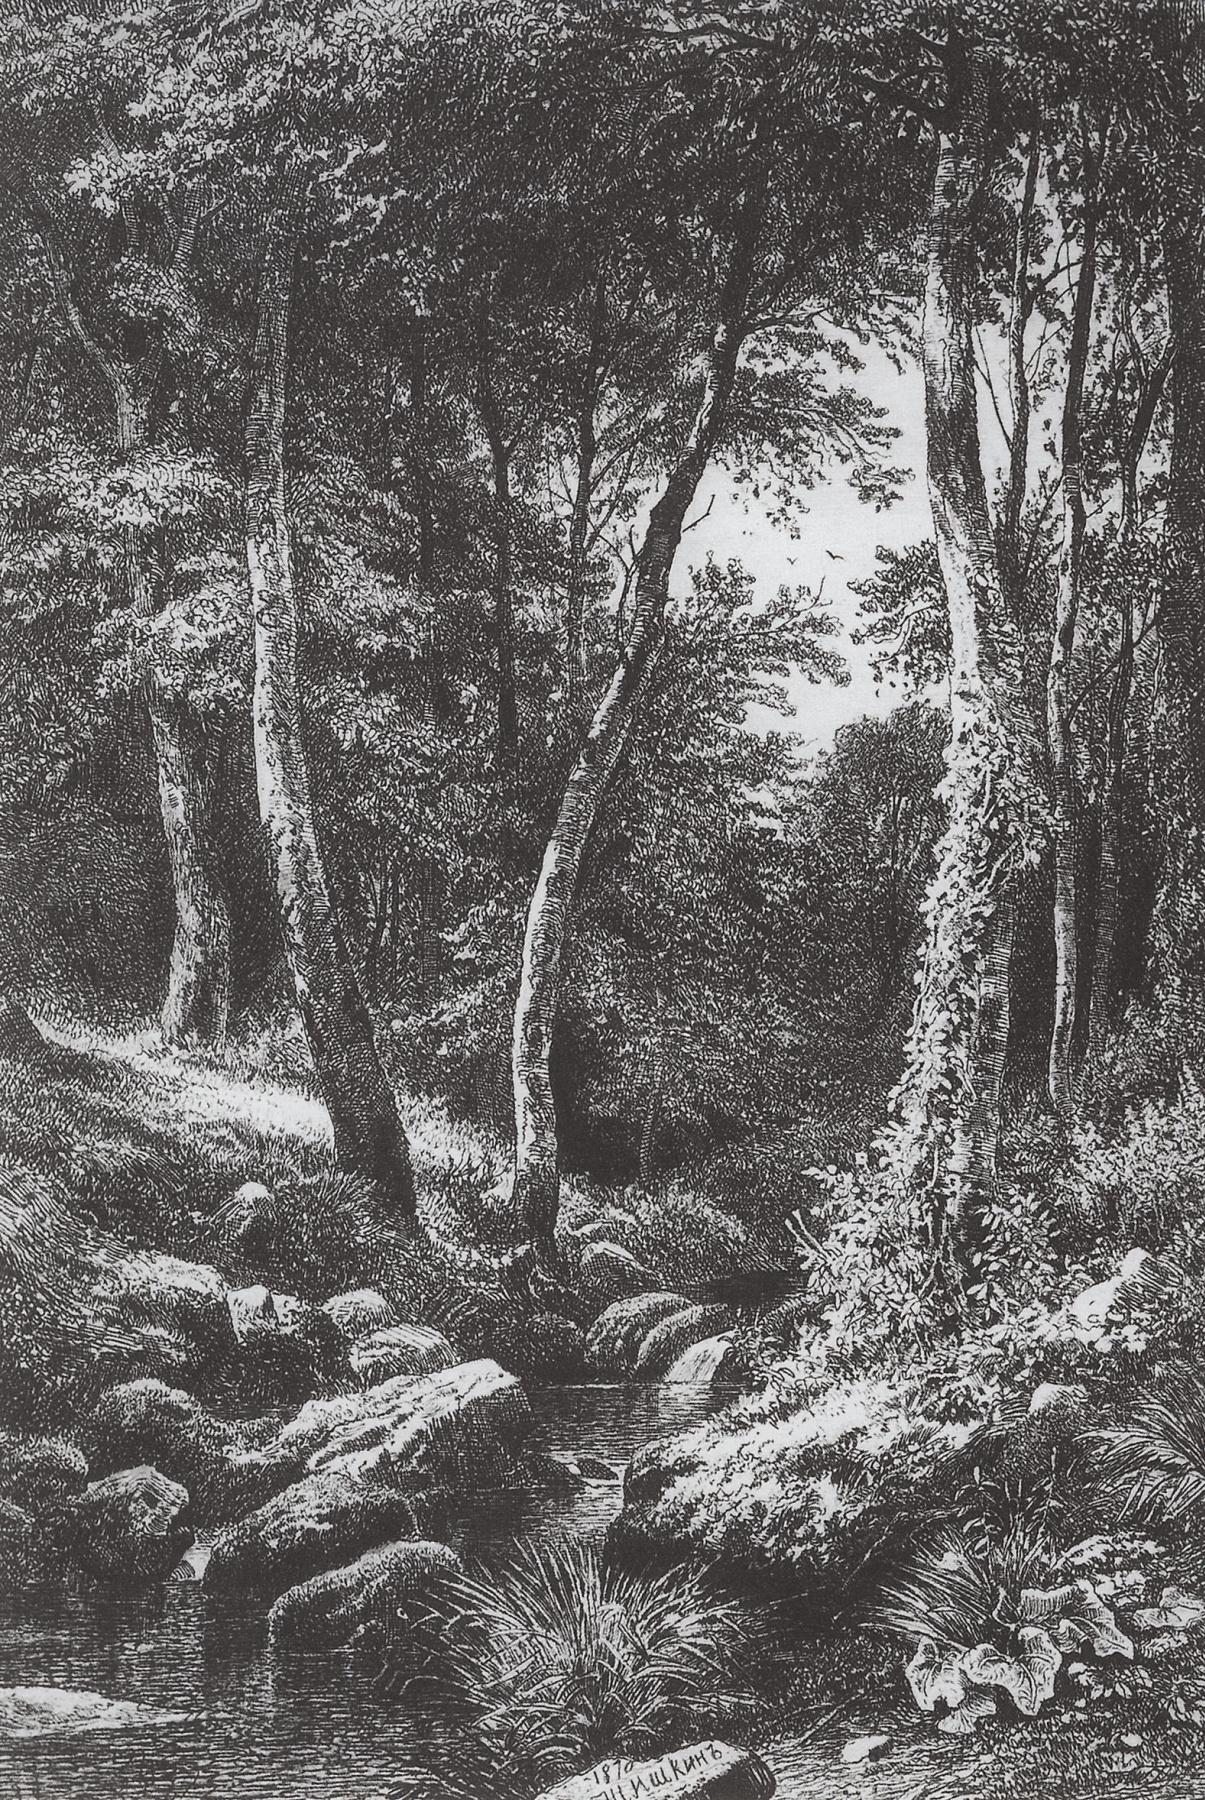 Ivan Shishkin. Stream in the forest